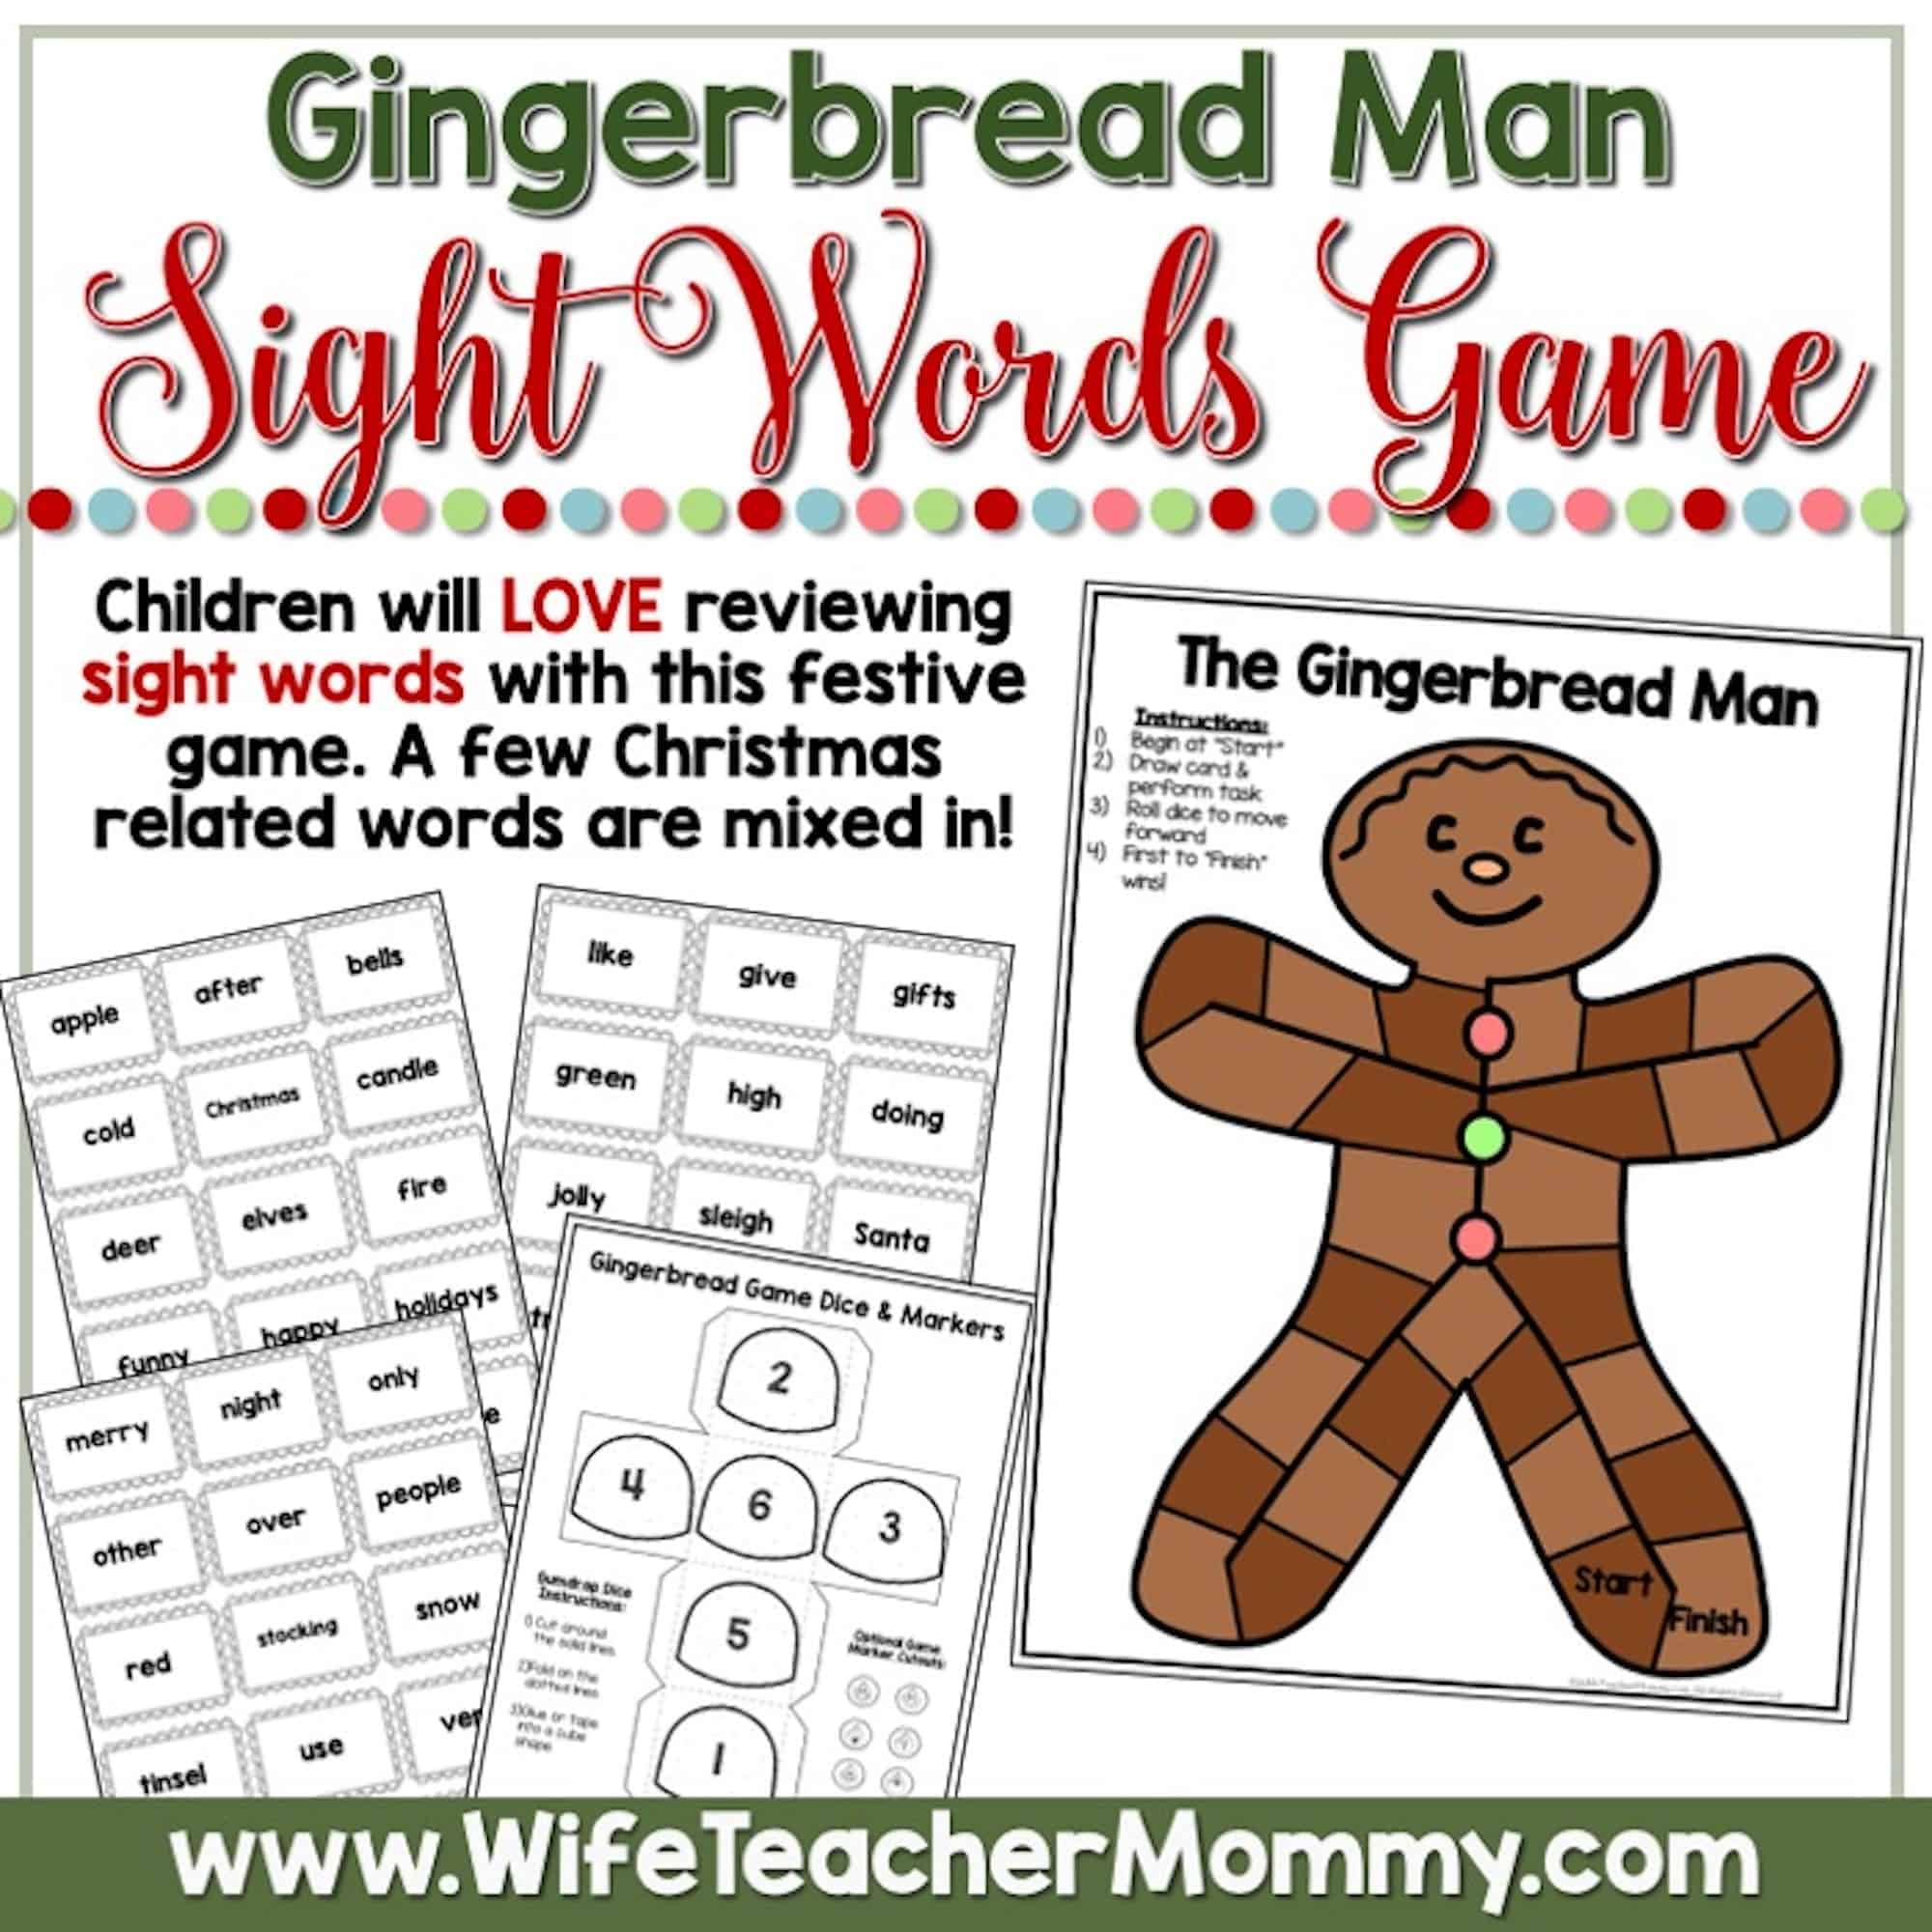 December Homeschool Lessons For 5th Grade Amp 6th Grade